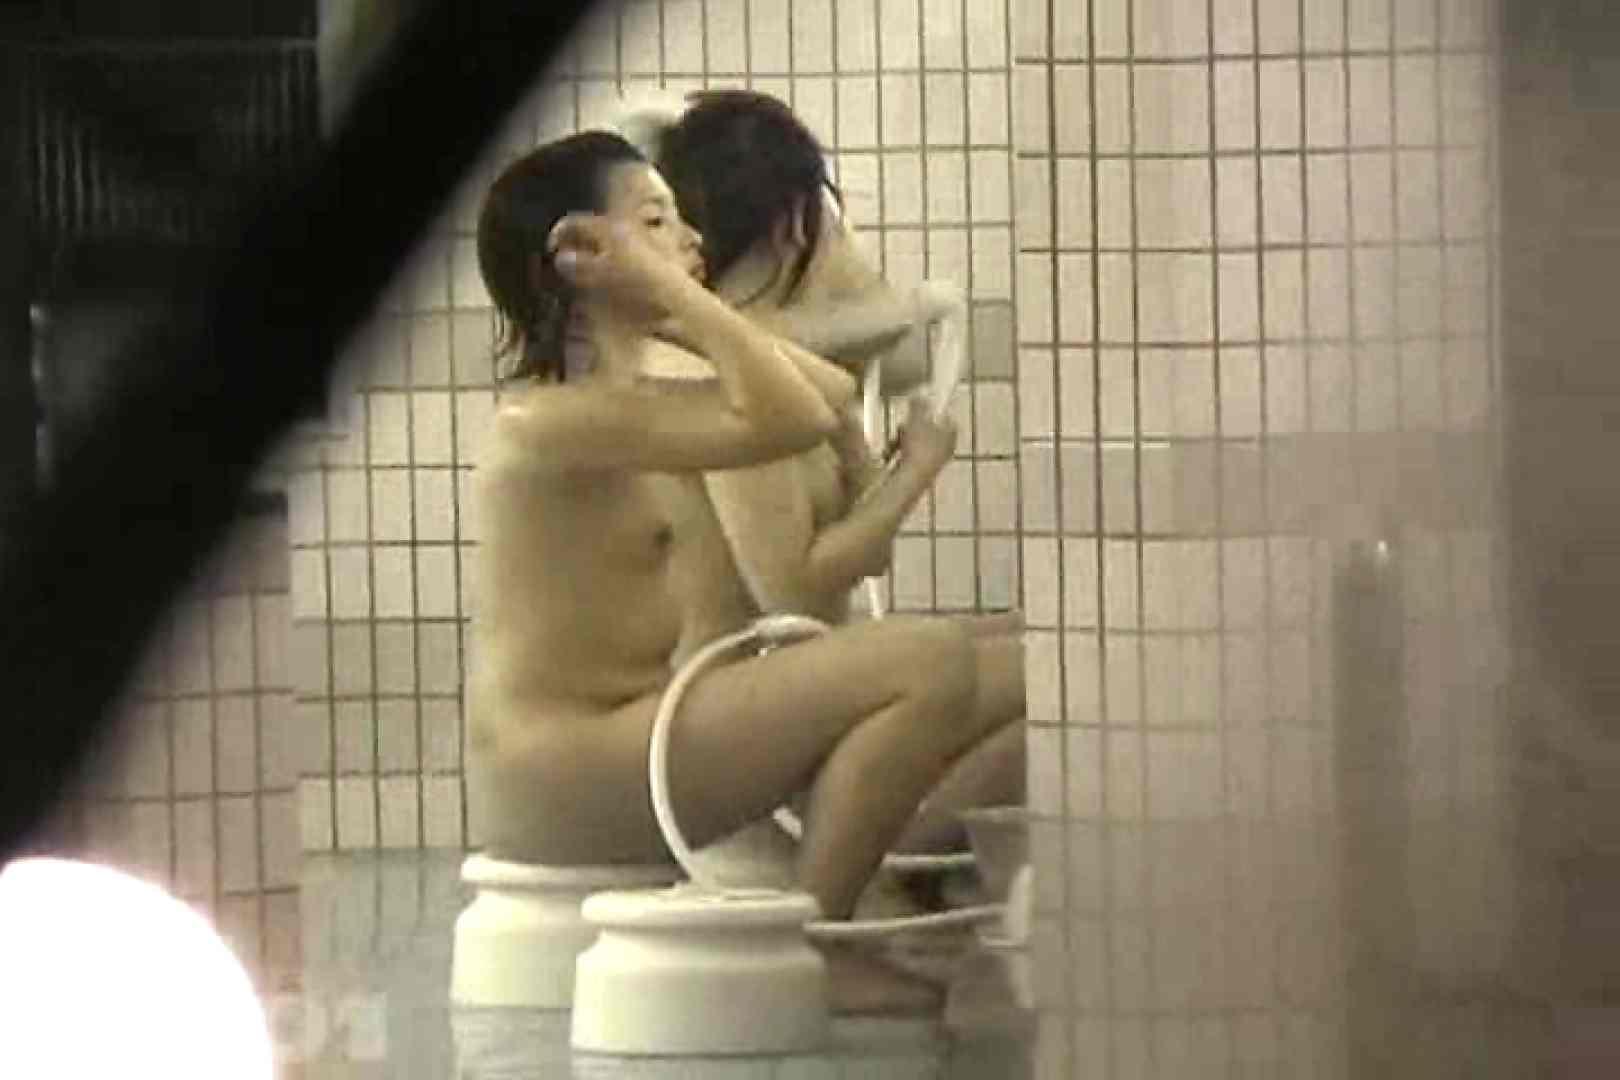 合宿ホテル女風呂盗撮高画質版 Vol.01 盗撮・必見 濡れ場動画紹介 106画像 97